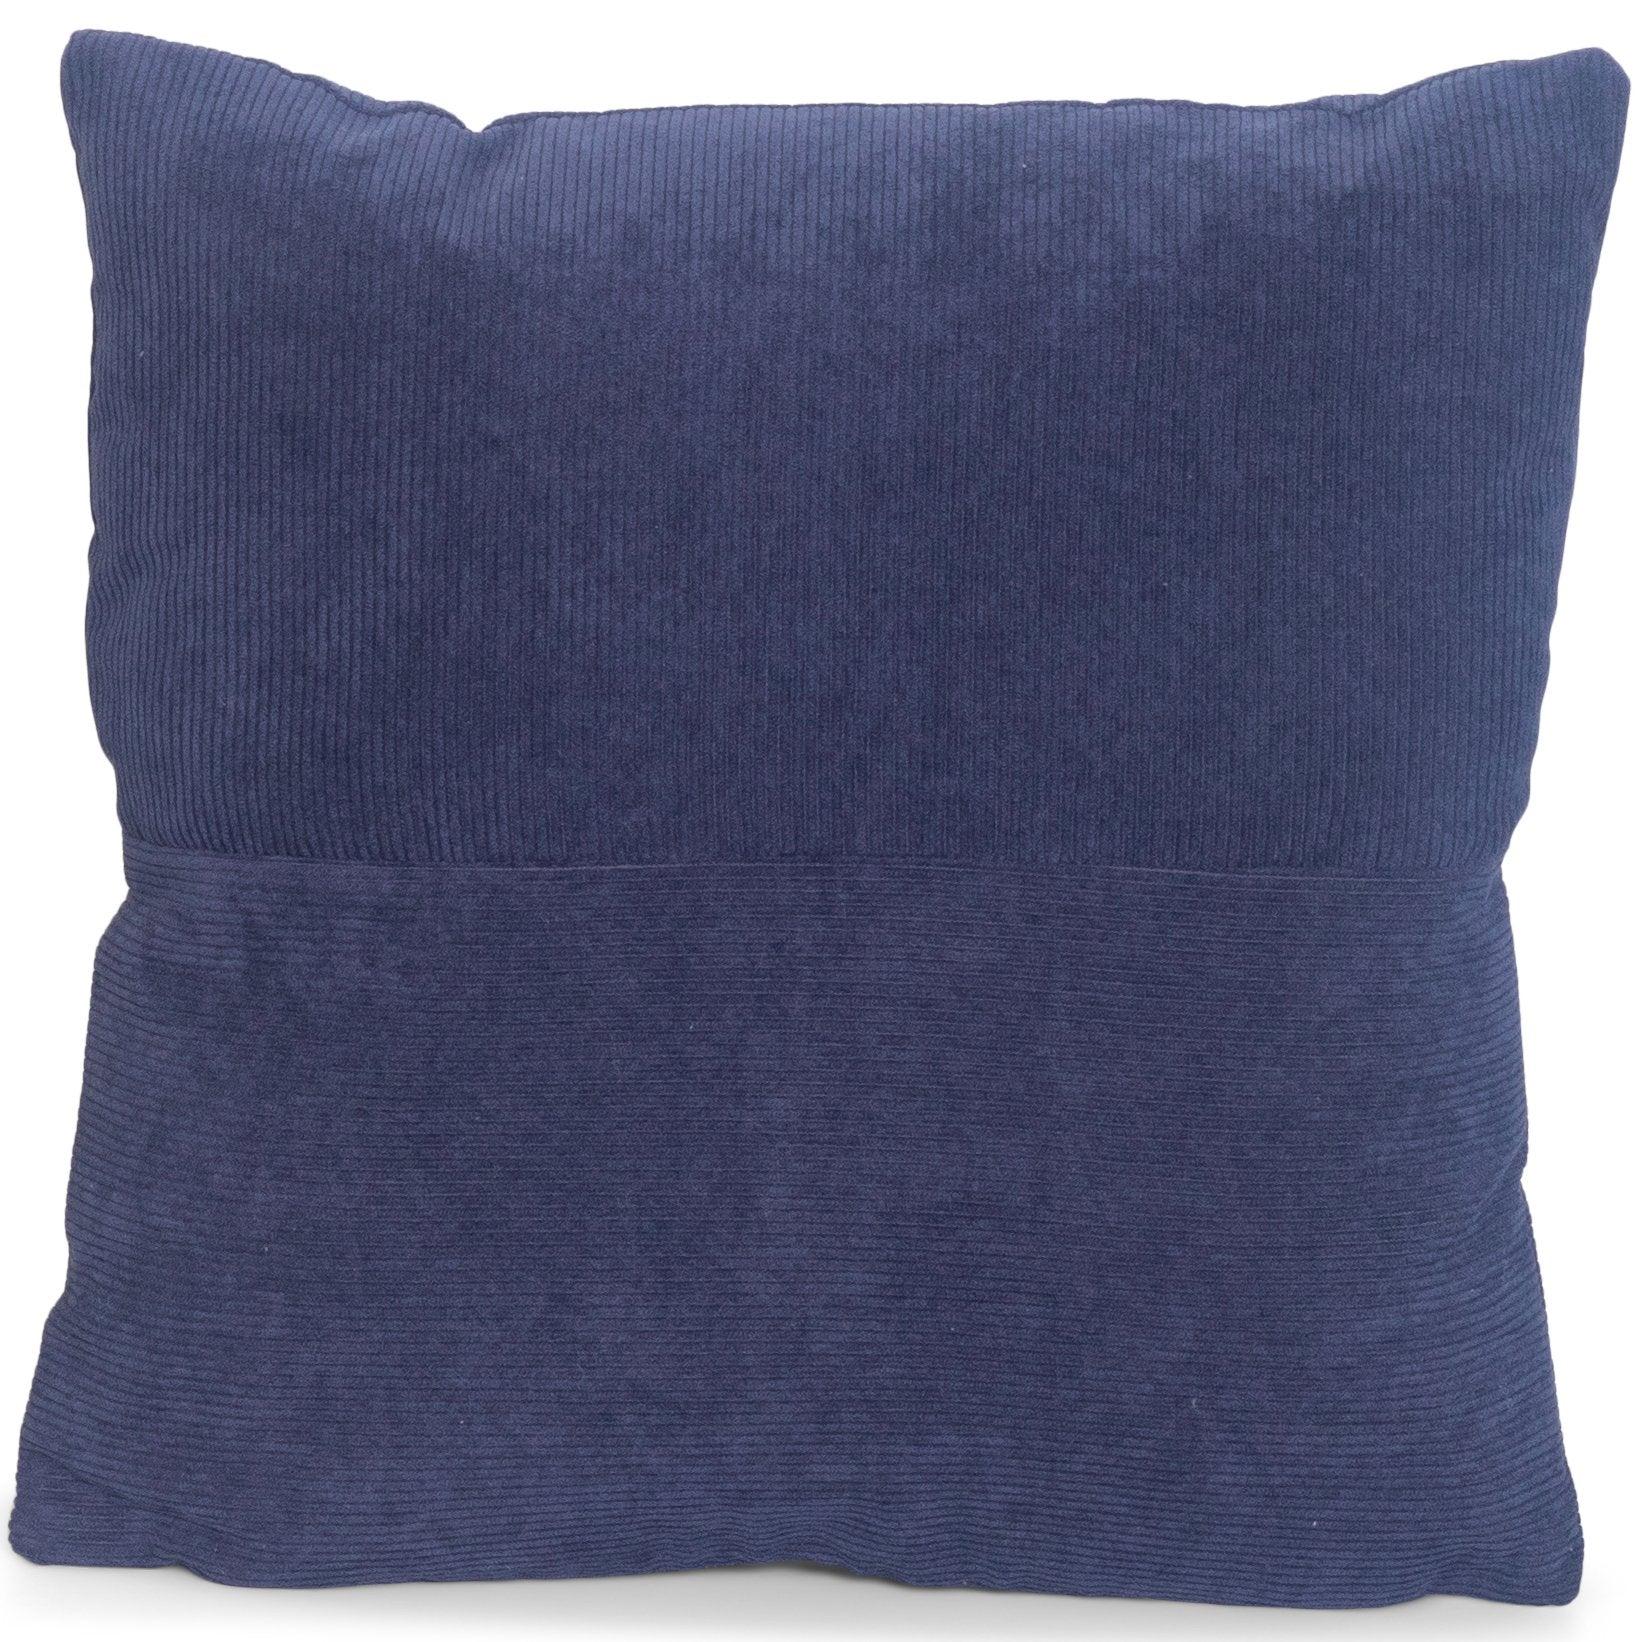 Nimara.se Ellen pude i blå fløjl 45x45 cm